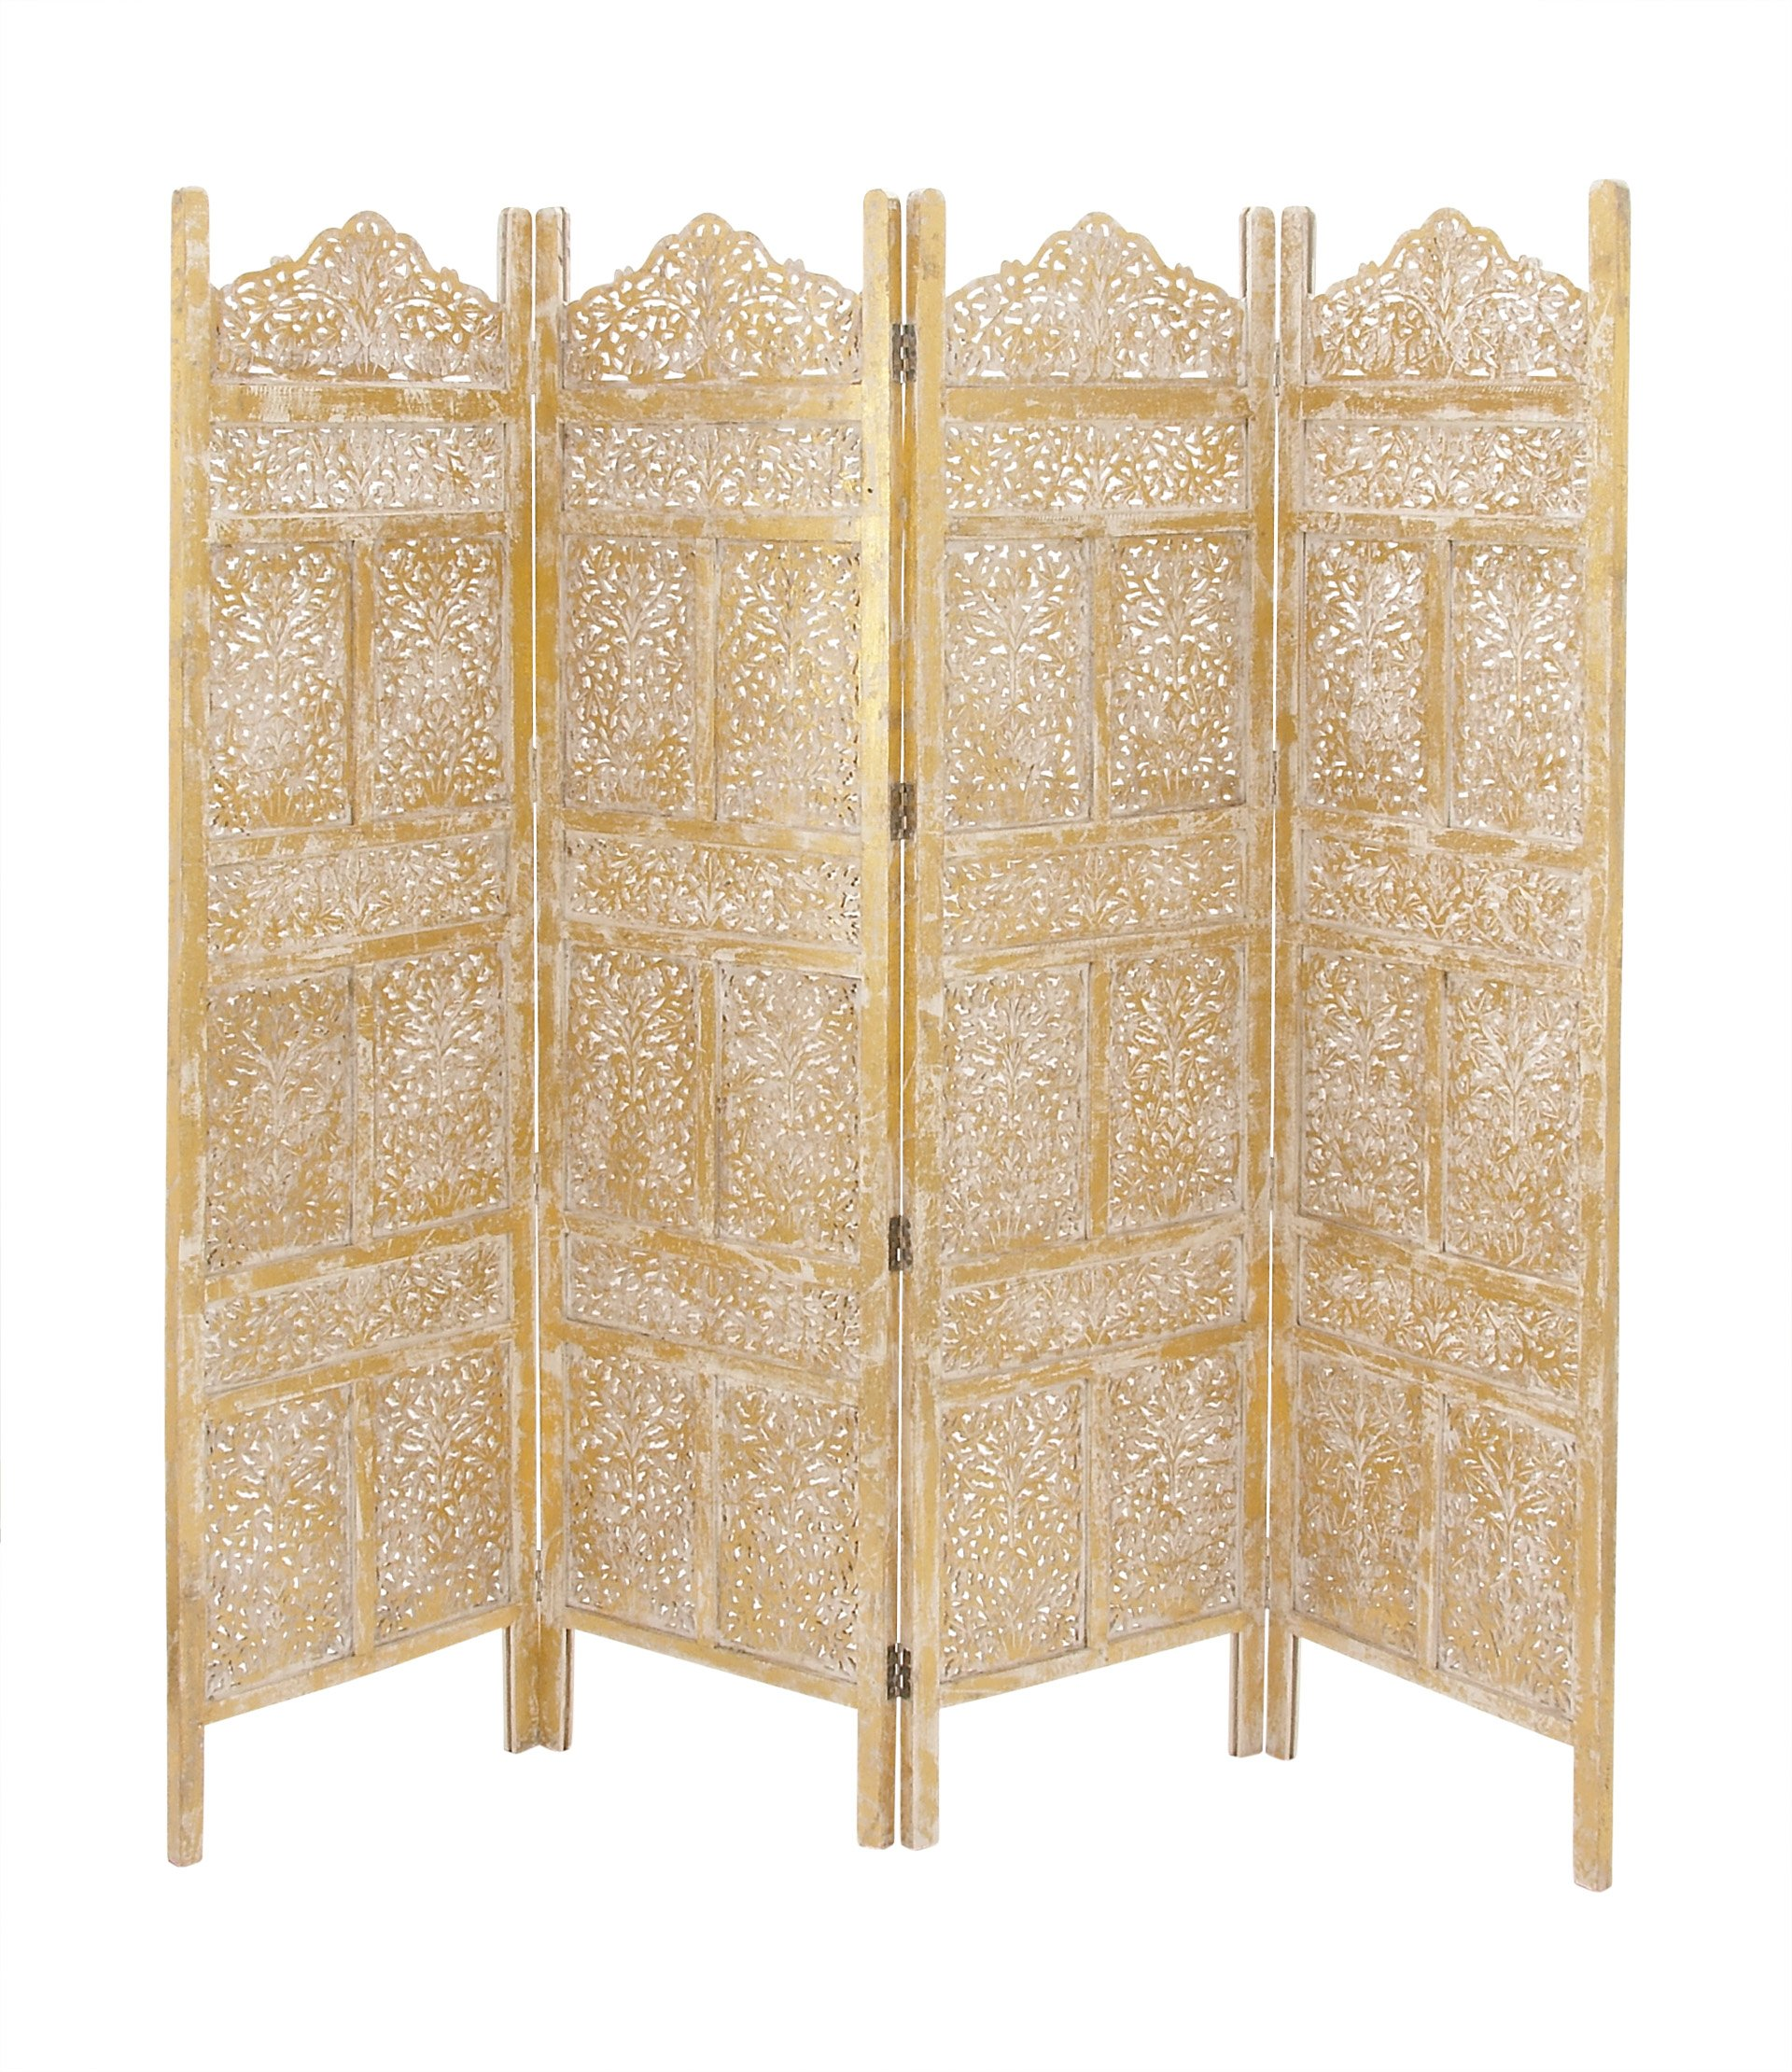 Deco 79 96060 Wood Gold 4 Panel Screen, 80'' x 71''